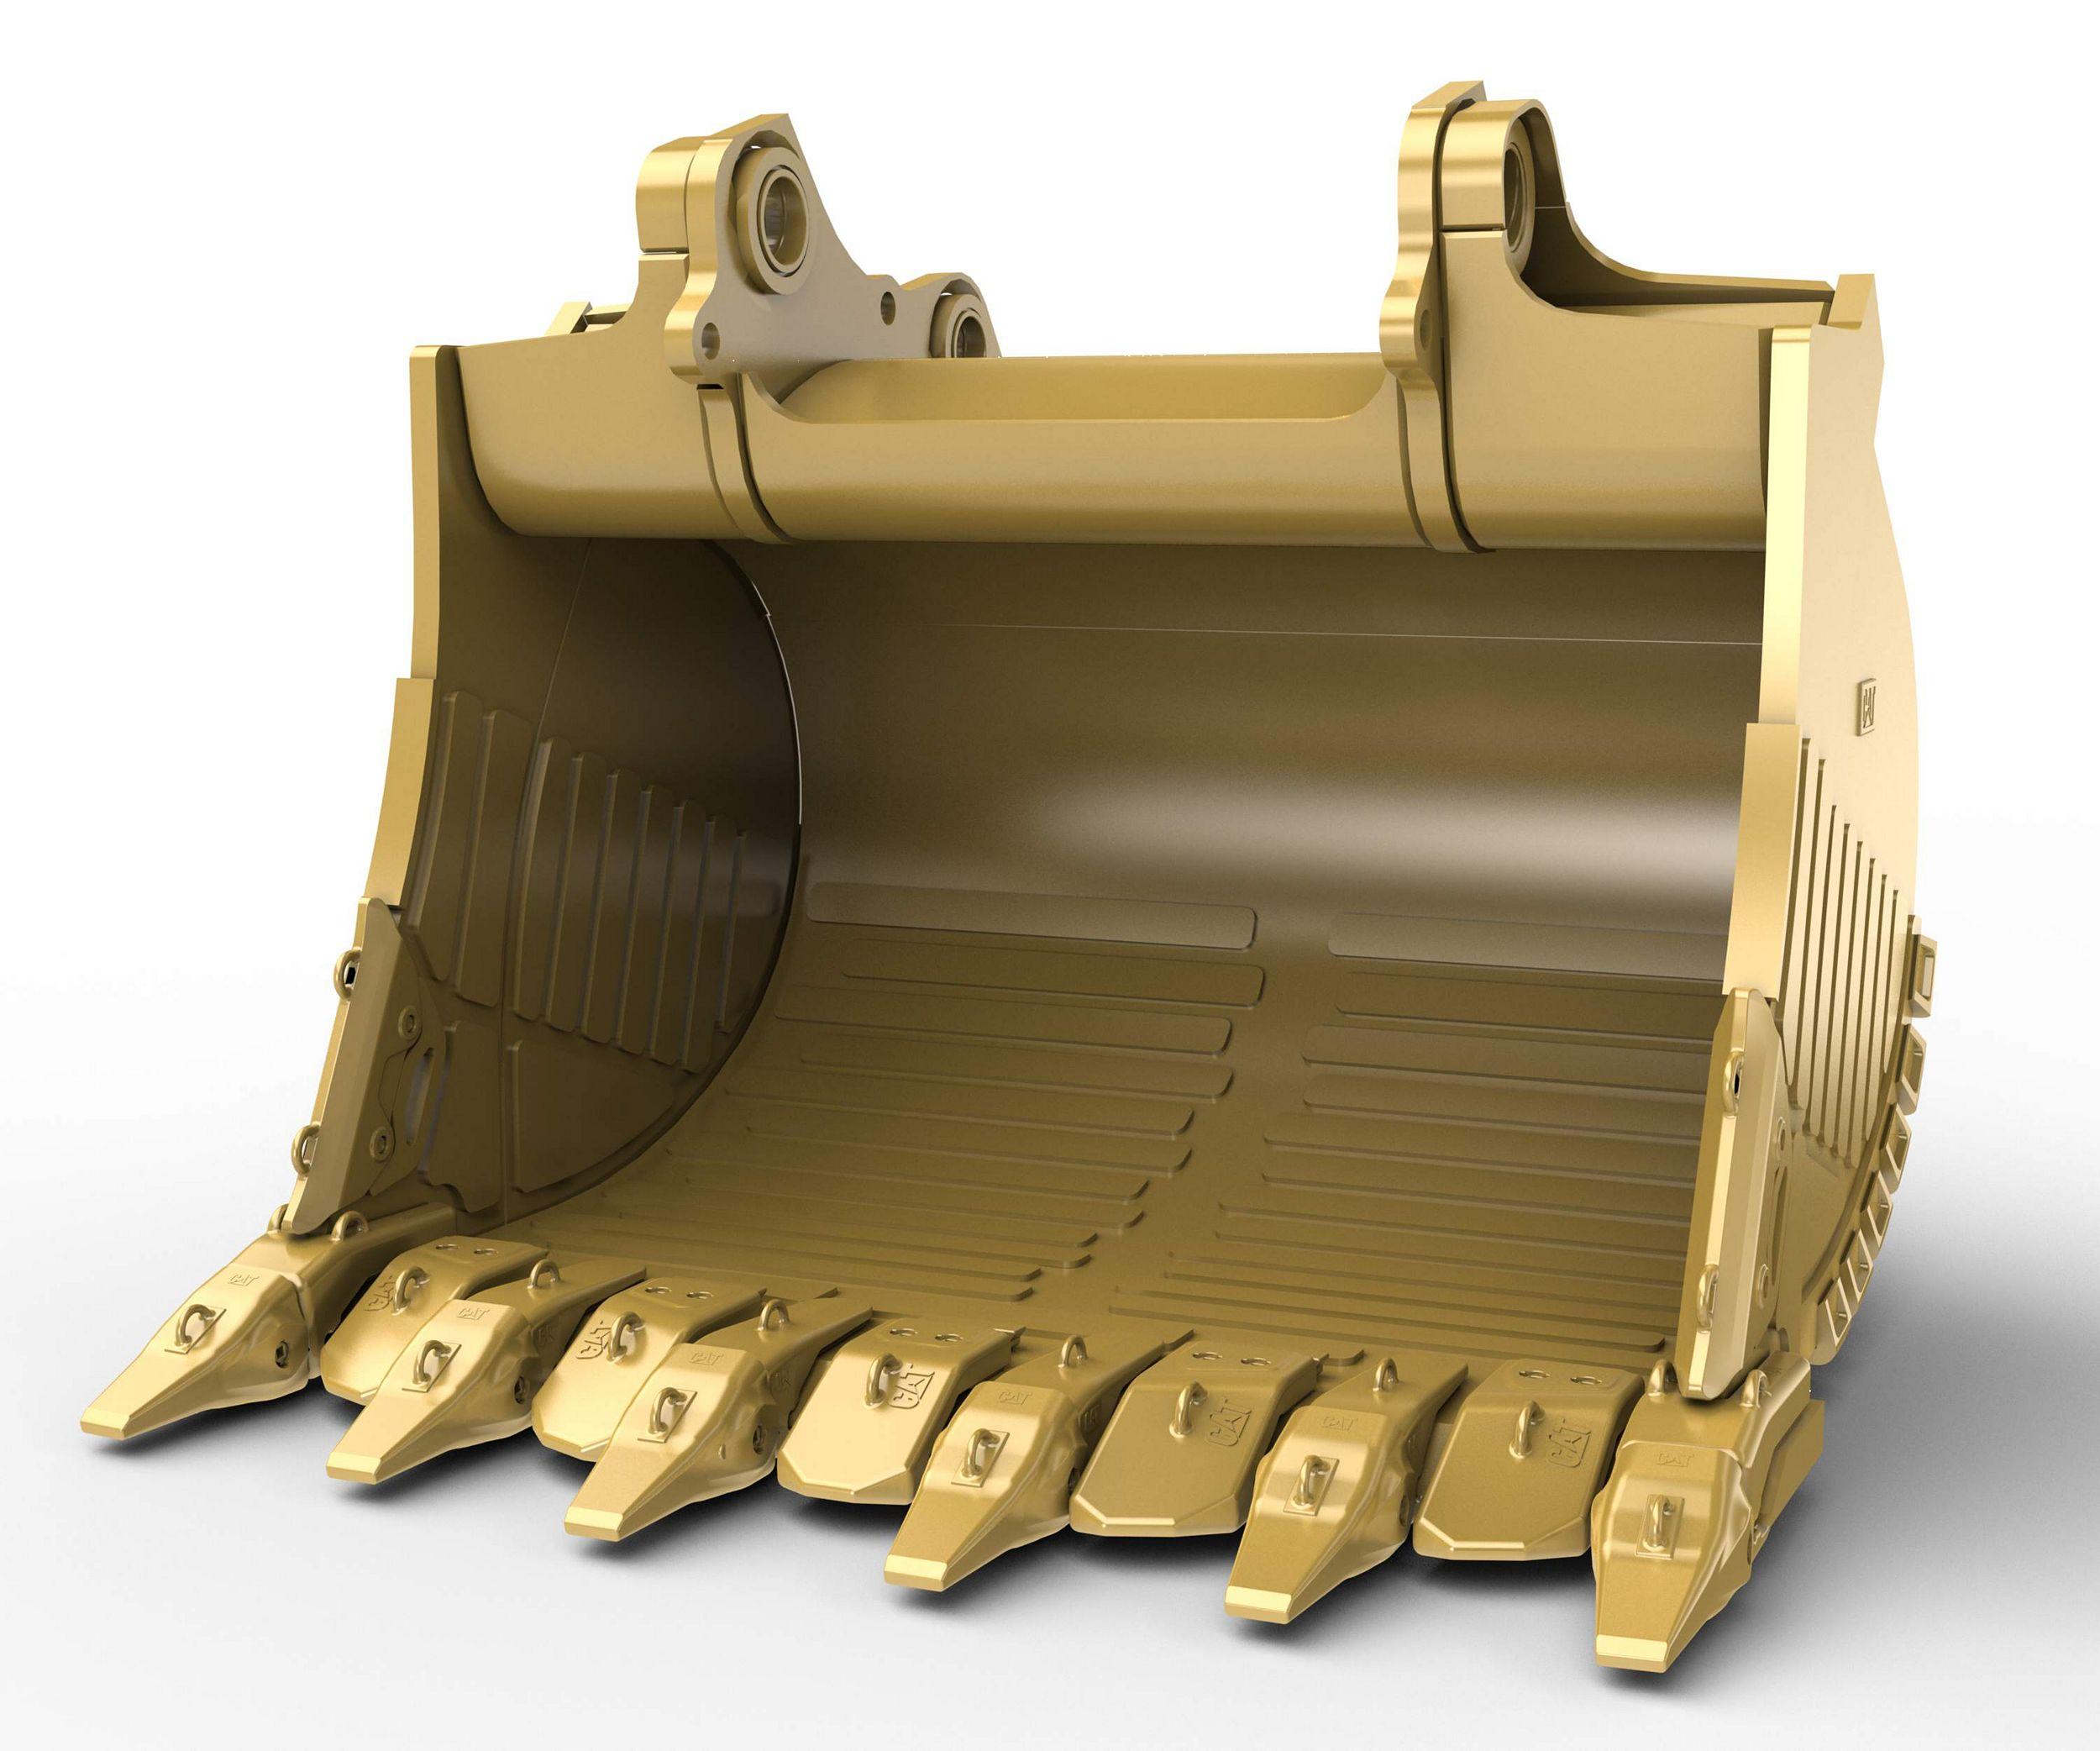 11m³ (14.4yd³) Standard Rock bucket for the 6020B Hyd Mining Shovel